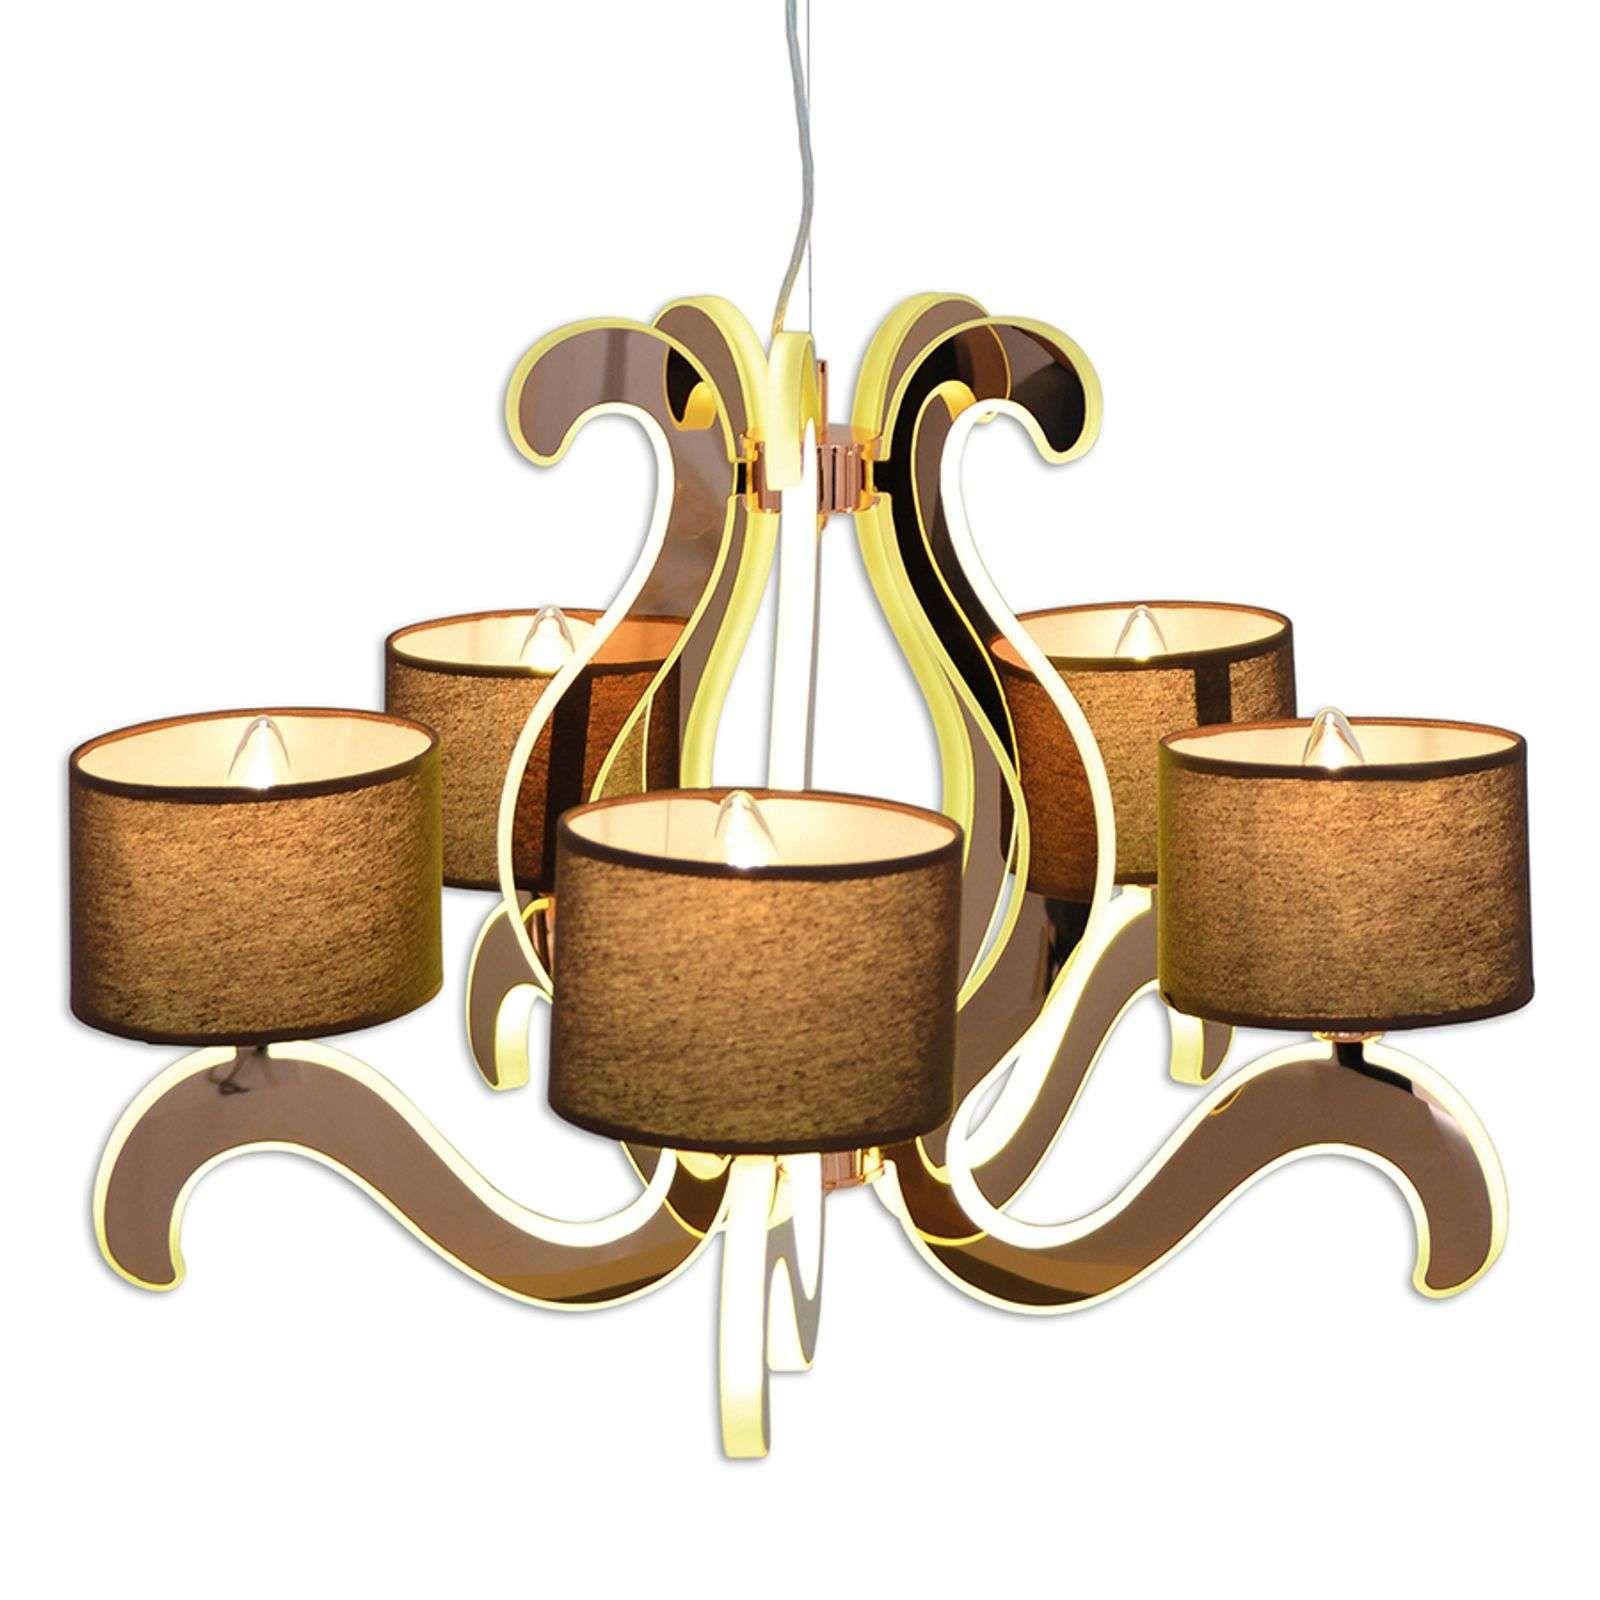 Moderne Wandleuchten Innen Deckenlampen Online Bestellen Hängeleuchten Led Esszimmer Led Einbaulampen Set Pendelleuchte Glas Holz Lustre Led Lamp Led